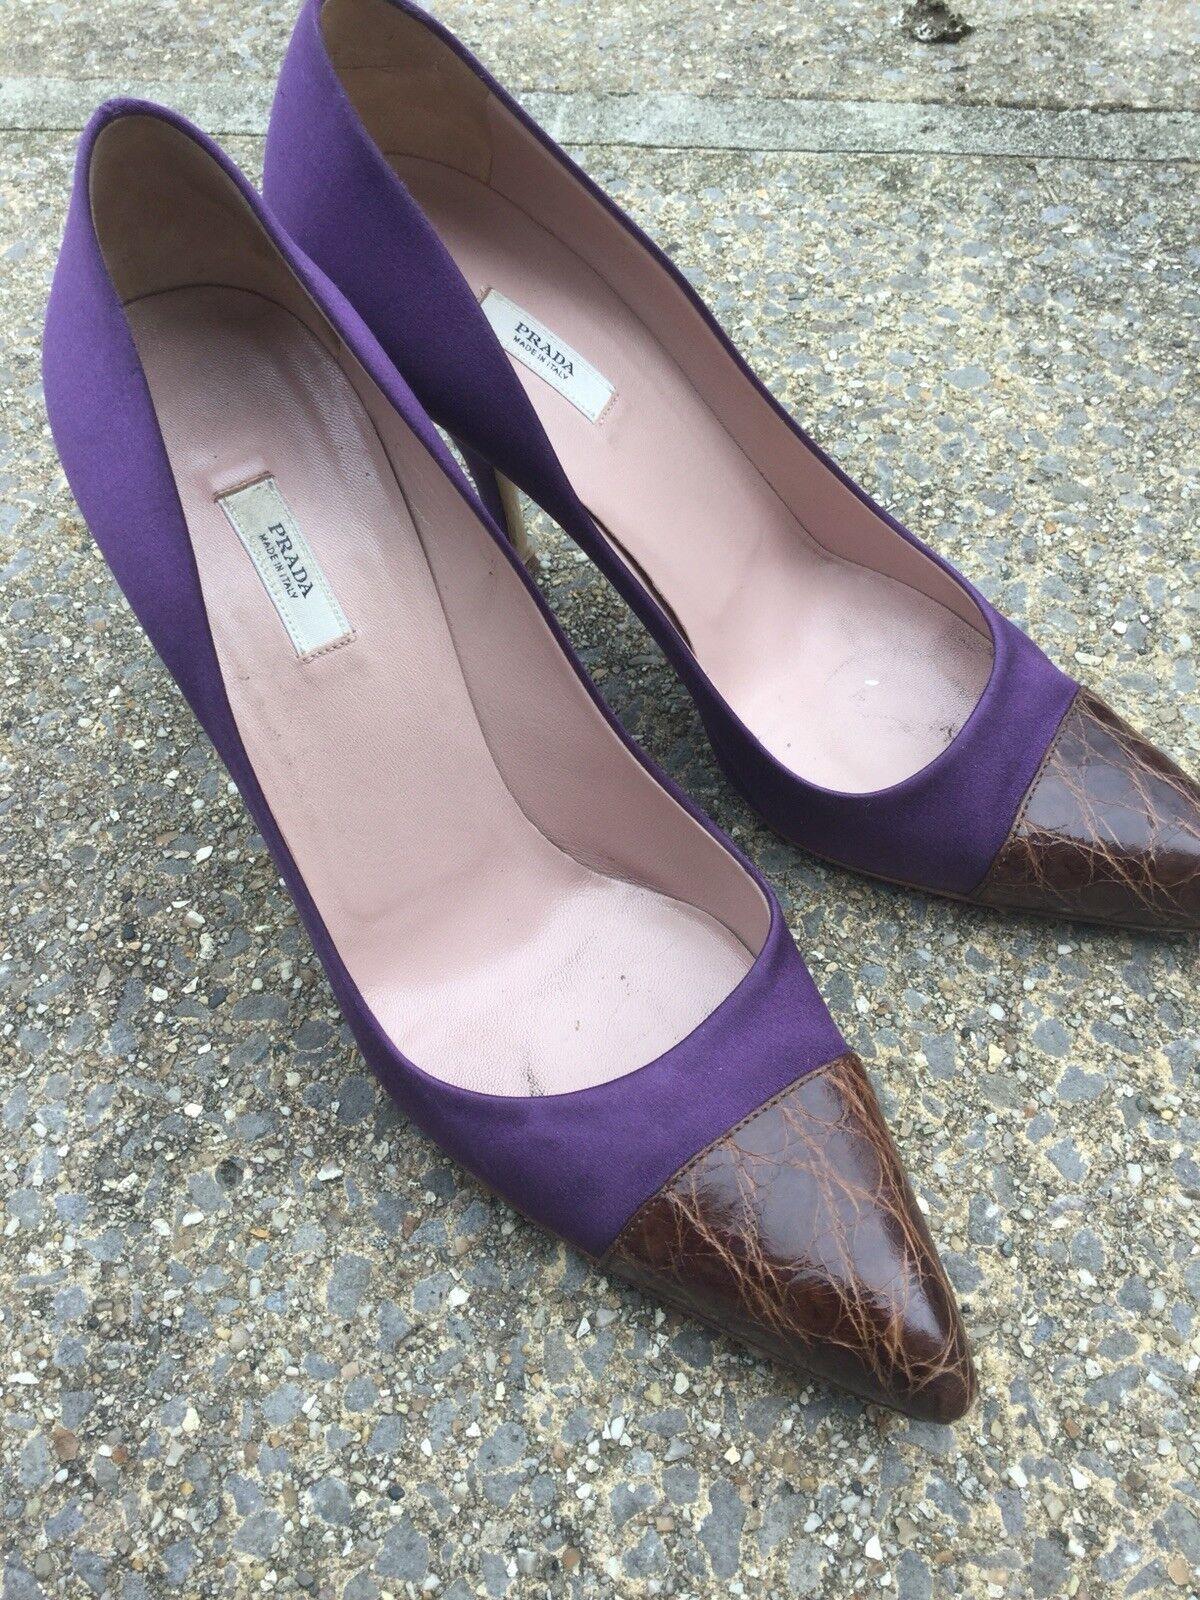 prada en cuir cuir cuir vintage violet prince tribunaux talons 39,5 sexy designer 9f7abb